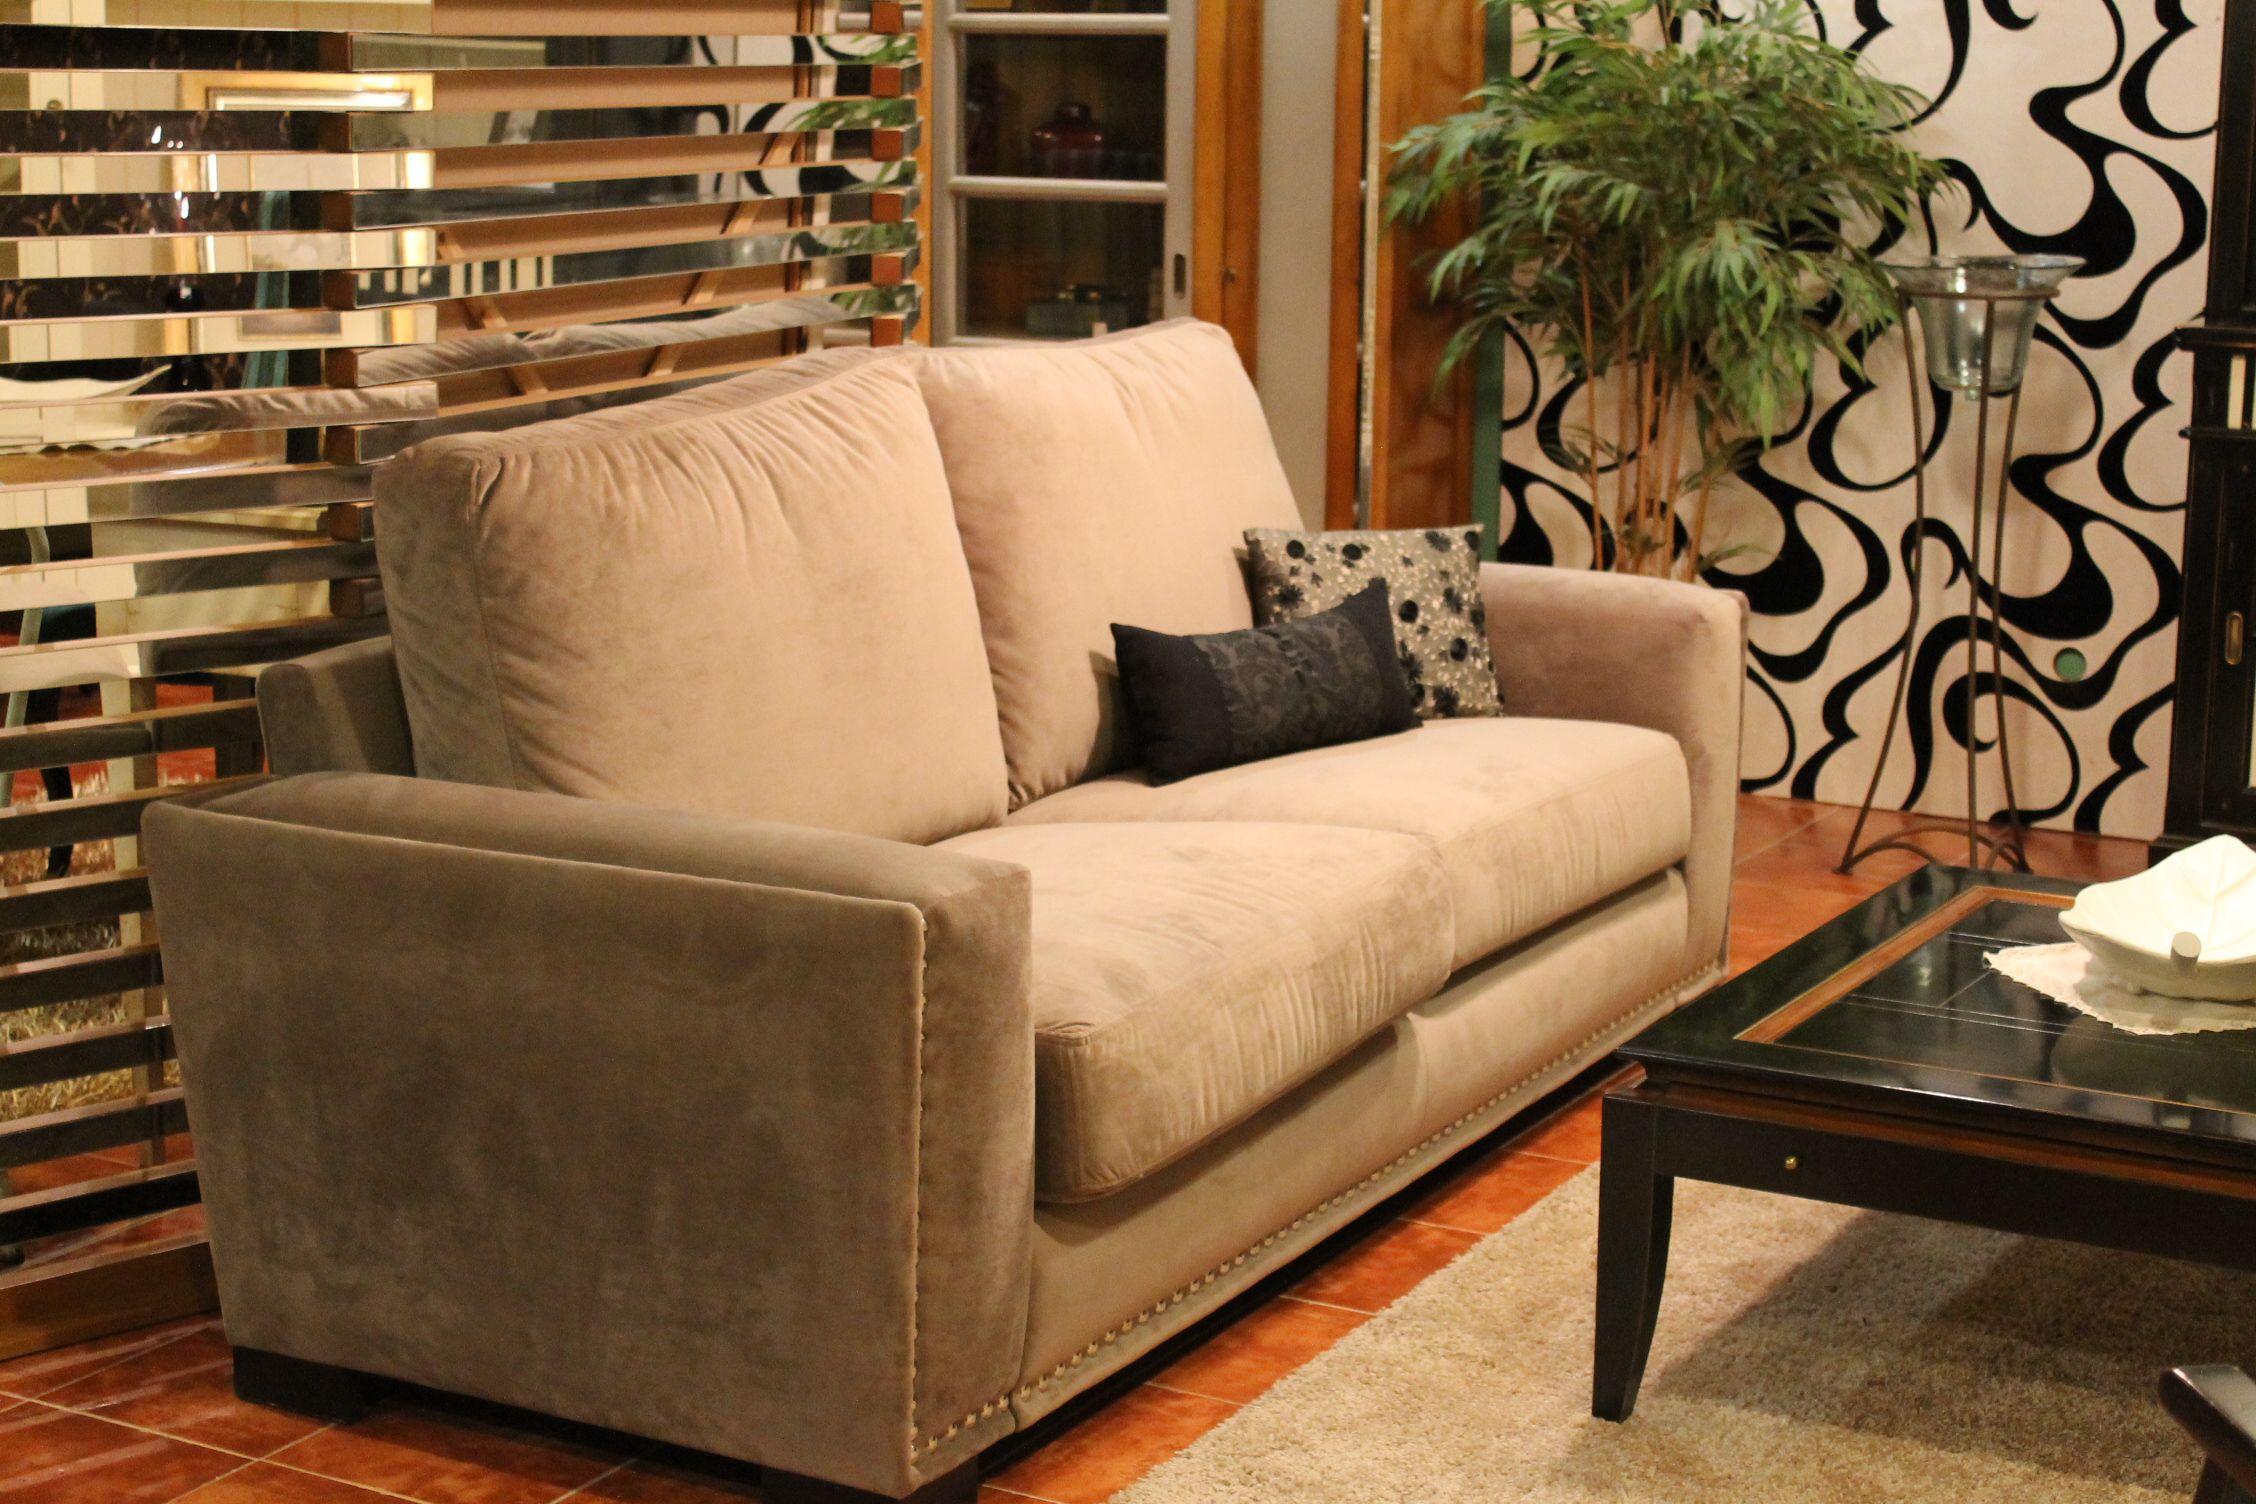 Sofa estilo clasico tapizado en tela y con tachuelas modelo saratoga - Sofas de tela ...